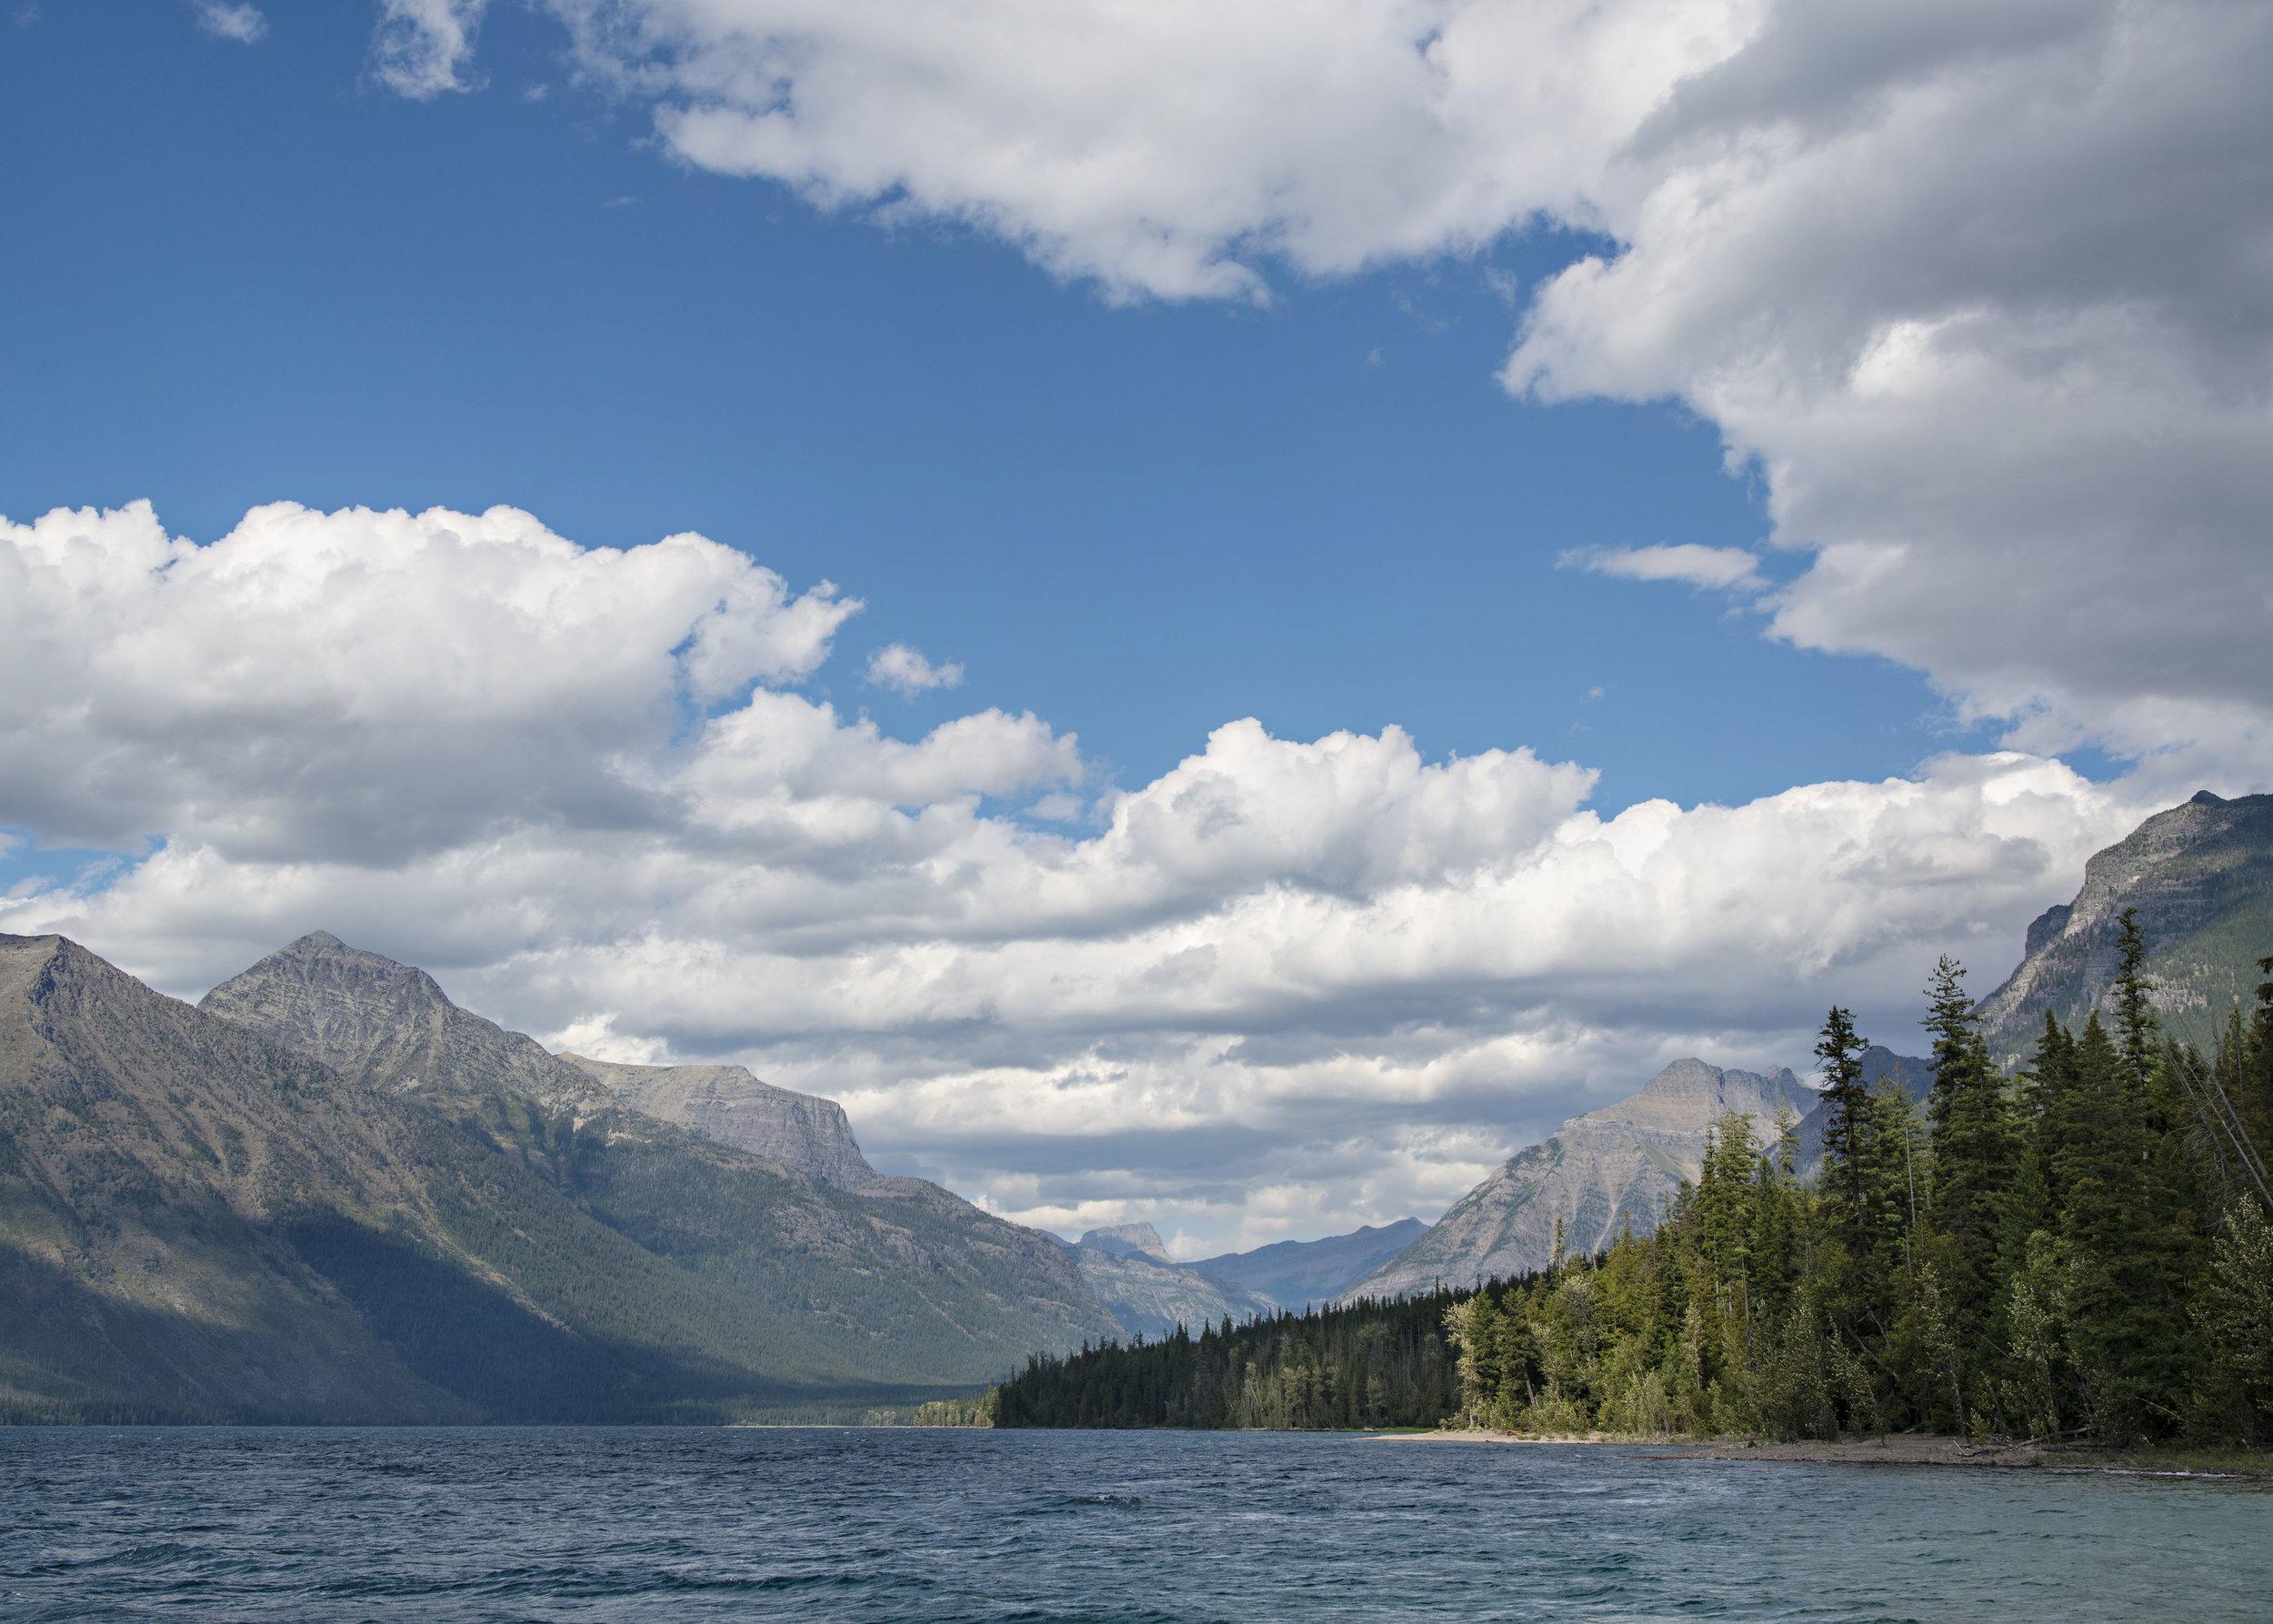 Lake McDonald, Glacier National Park. Nikon D800, Nikkor 24-120mm lens @ 38mm, ISO 100, f8, 1/500 sec.